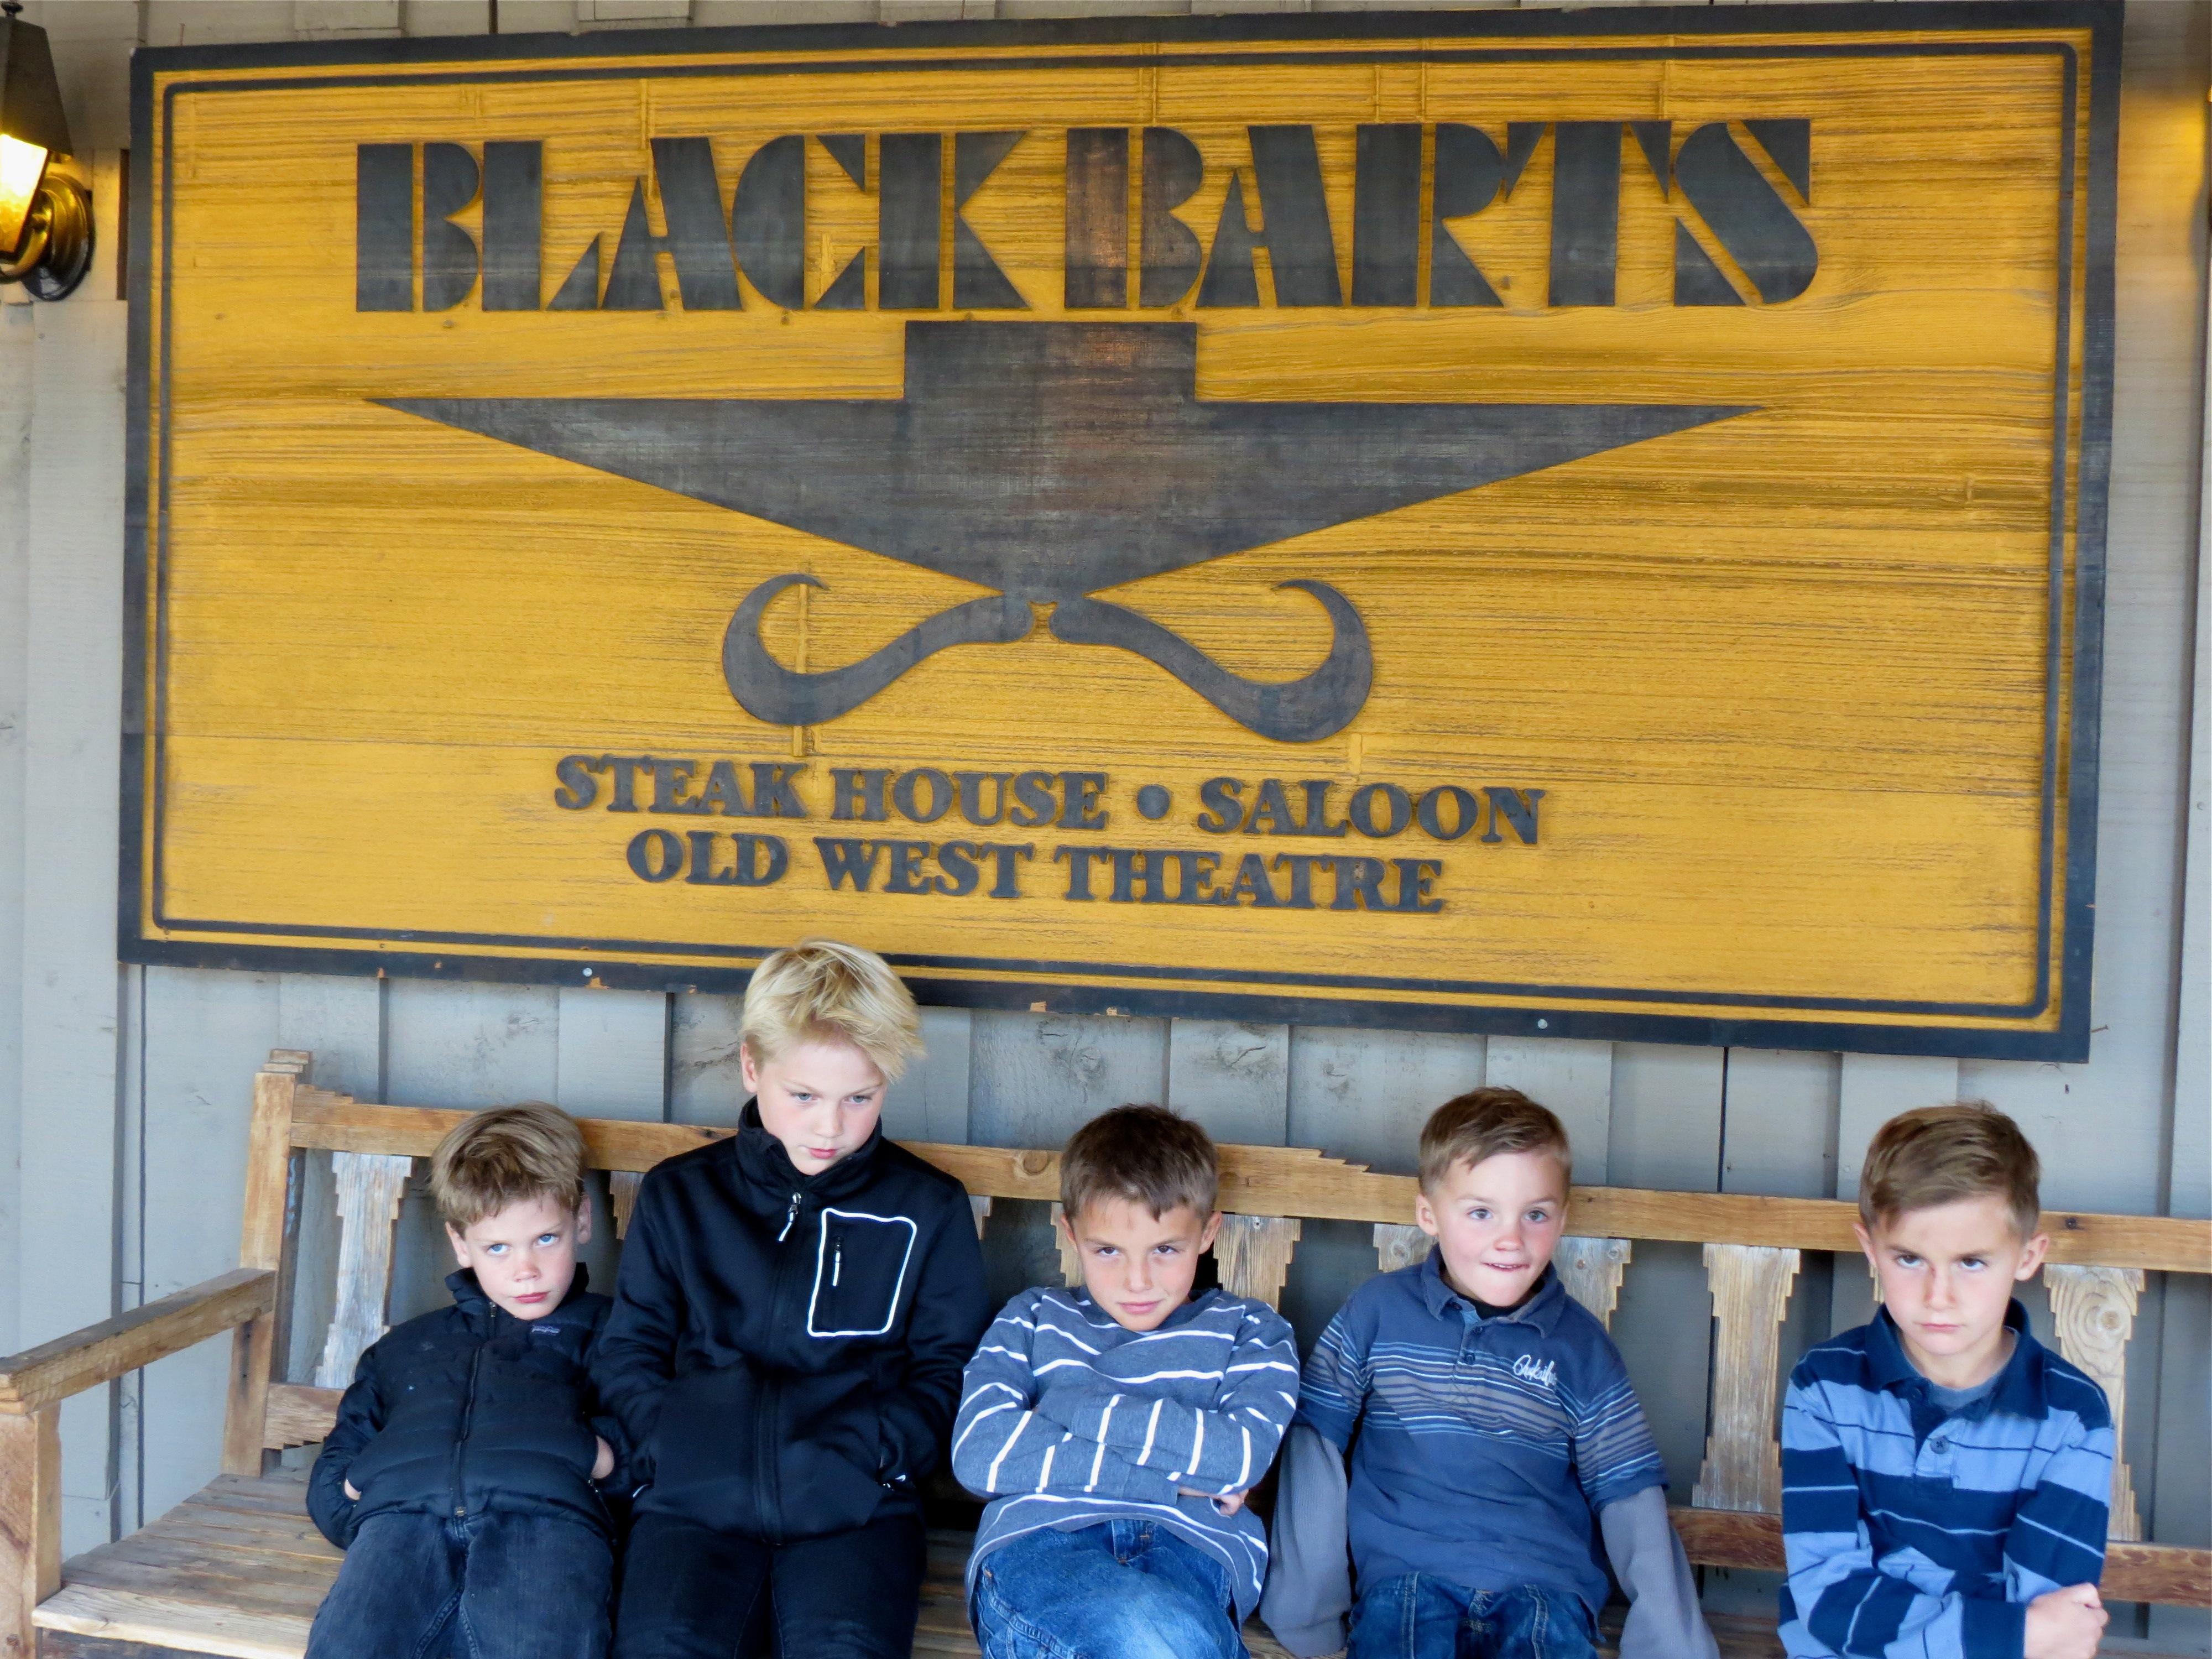 Black Bart's Steakhouse  in Flagstaff